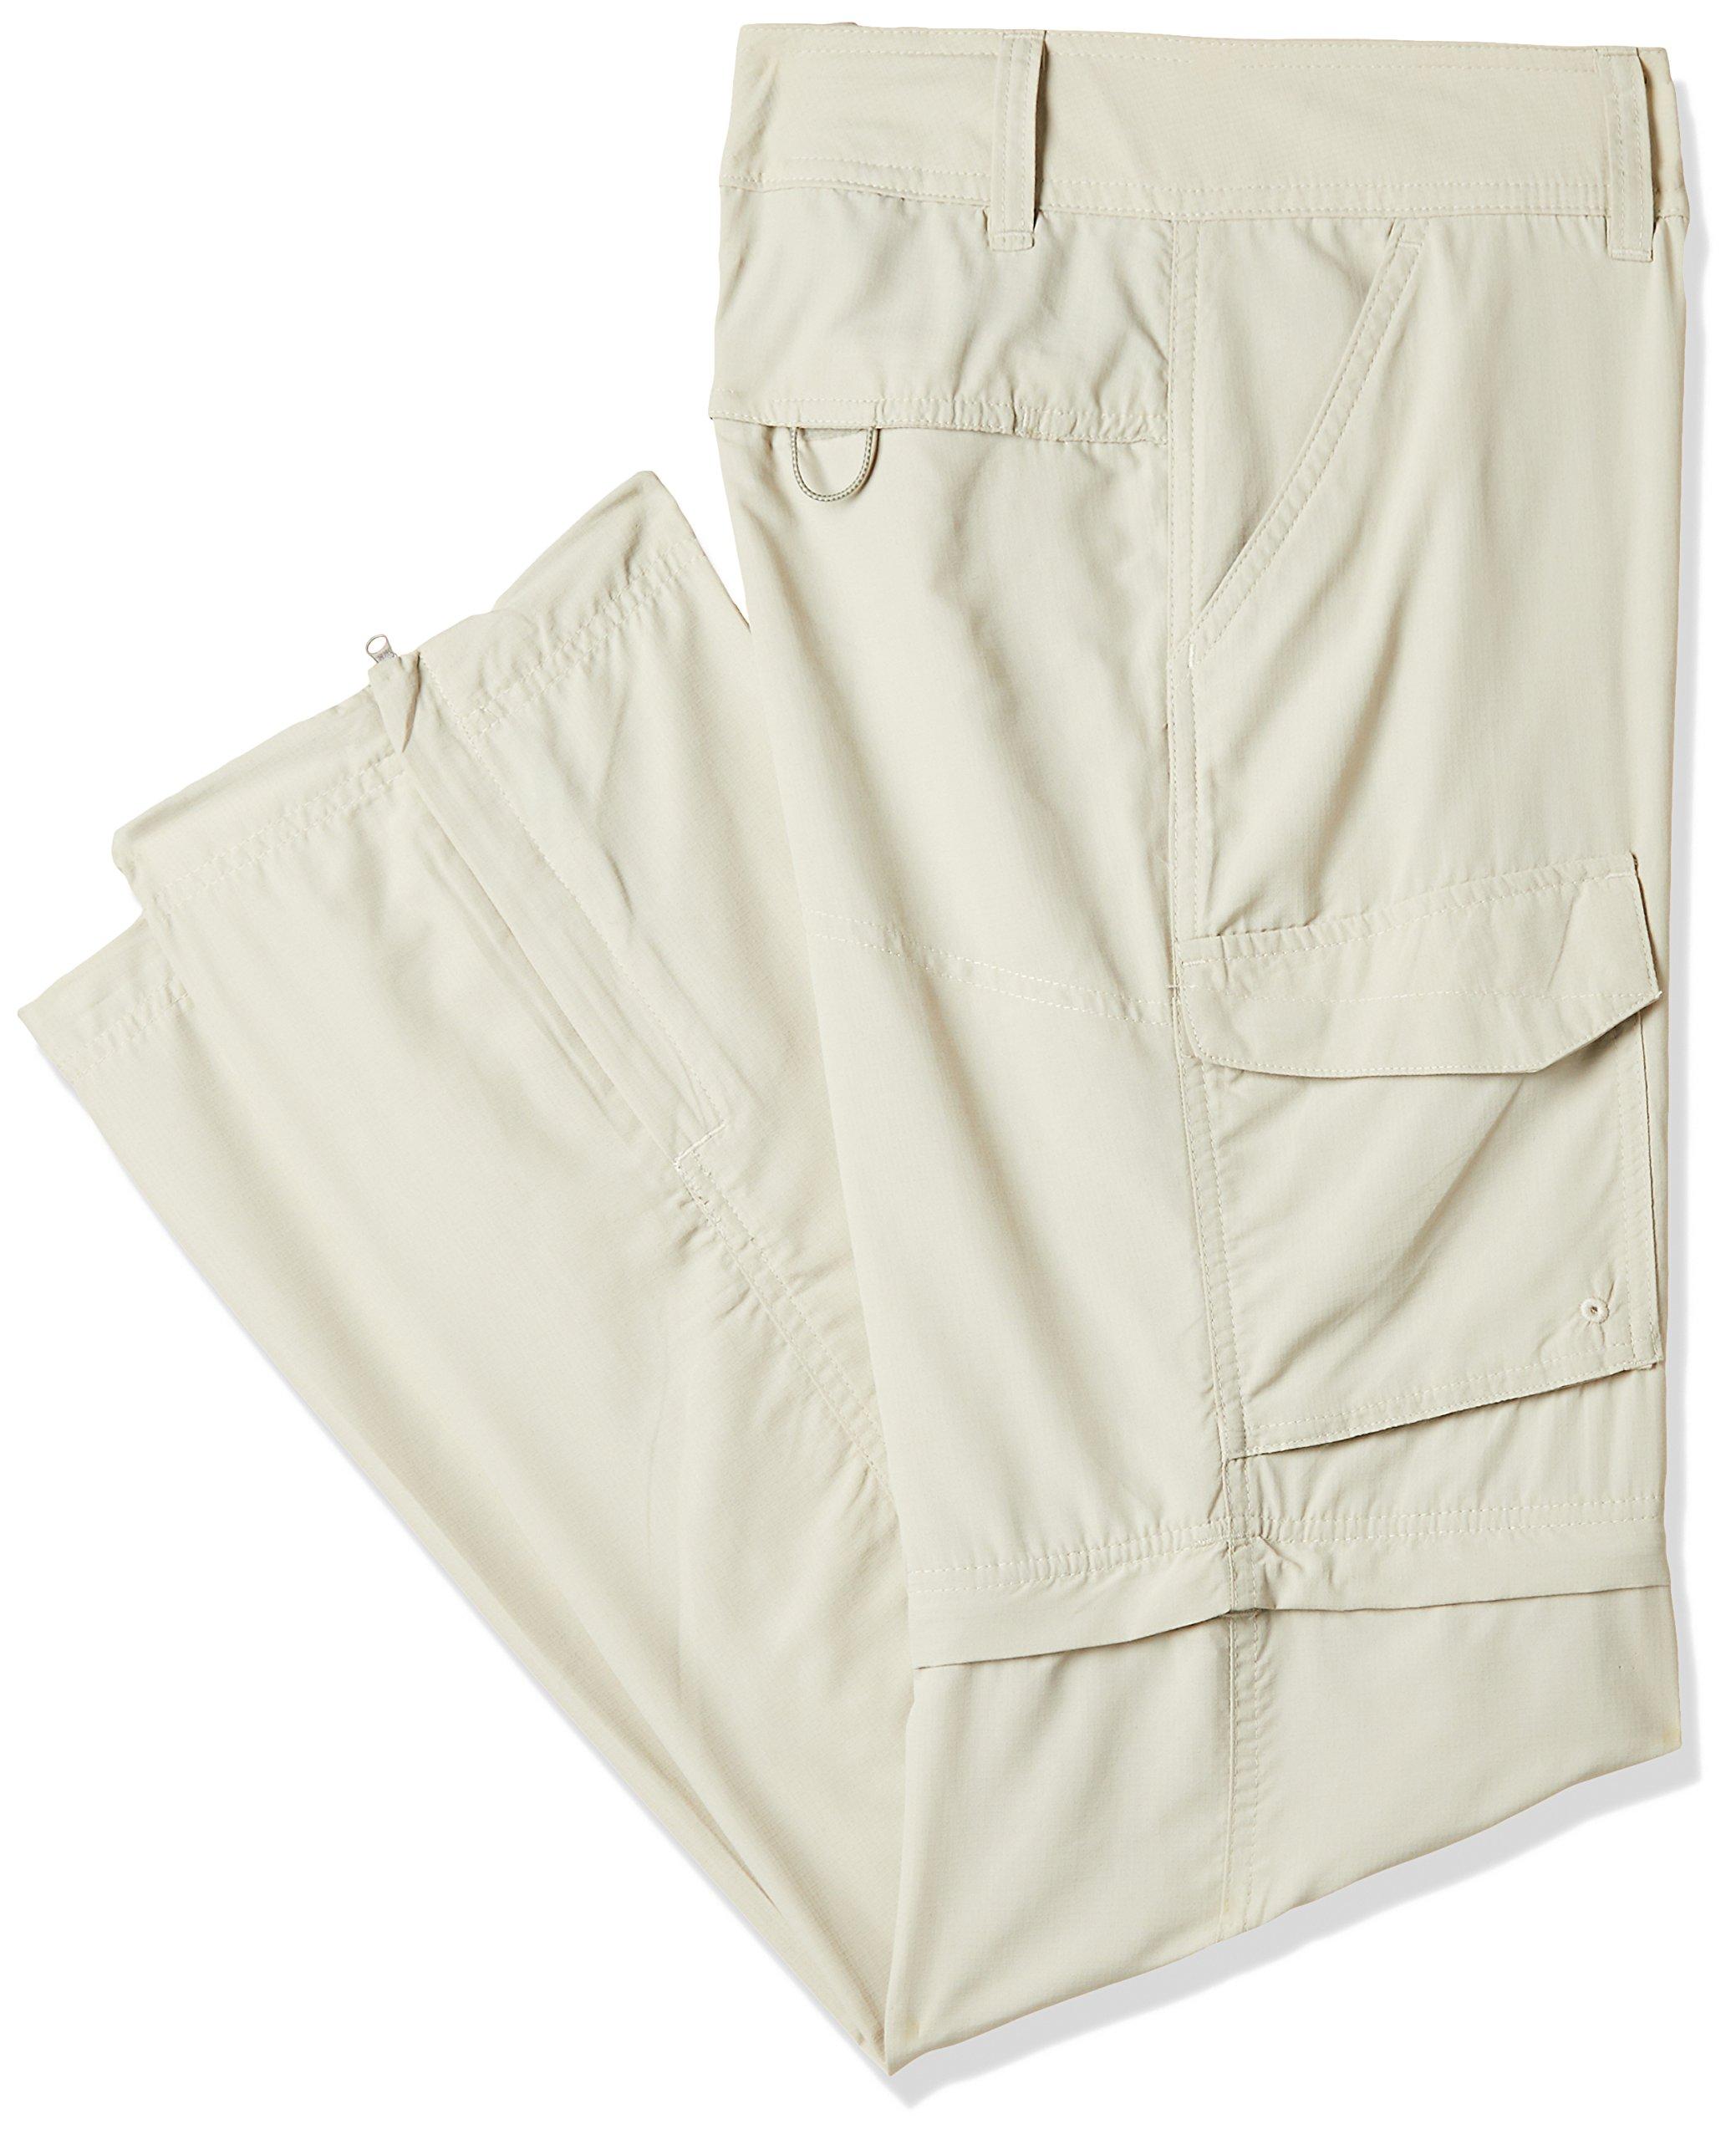 Columbia Silver Ridge Convertible Full Leg Pant, 2x Regular, Fossil,32.0 in long